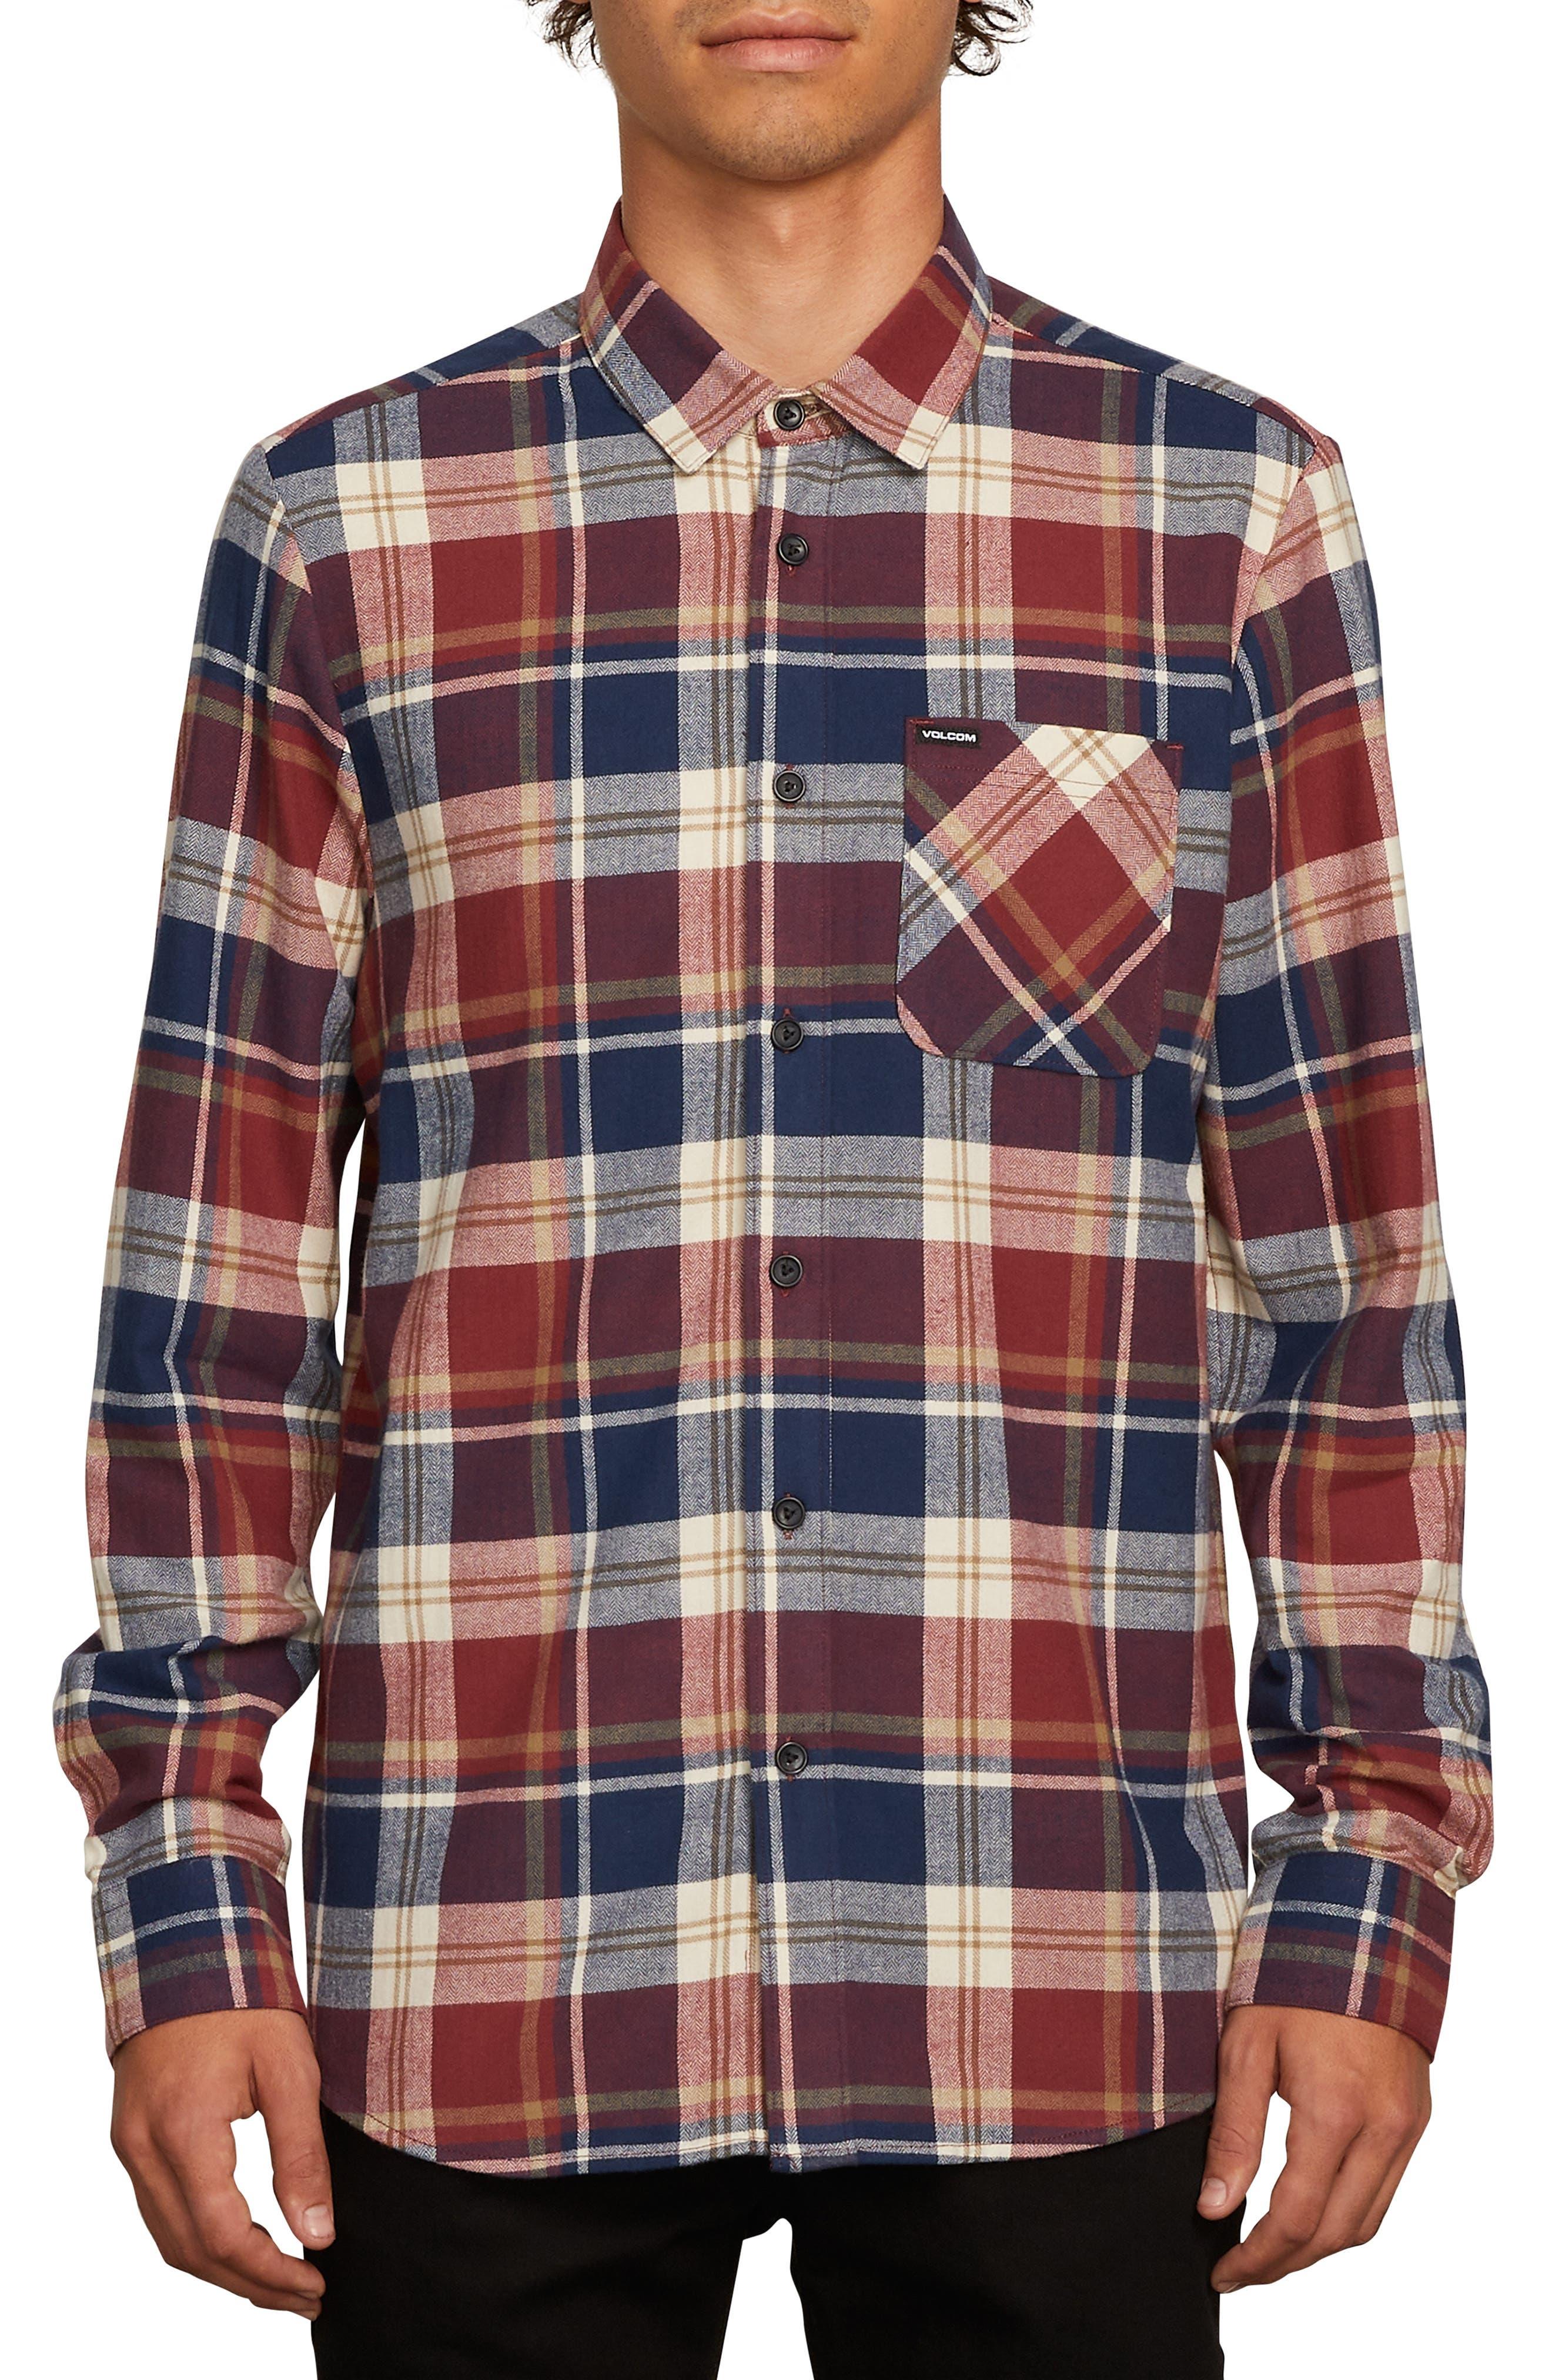 Caden Plaid Flannel Shirt,                             Main thumbnail 1, color,                             MELINDIGO